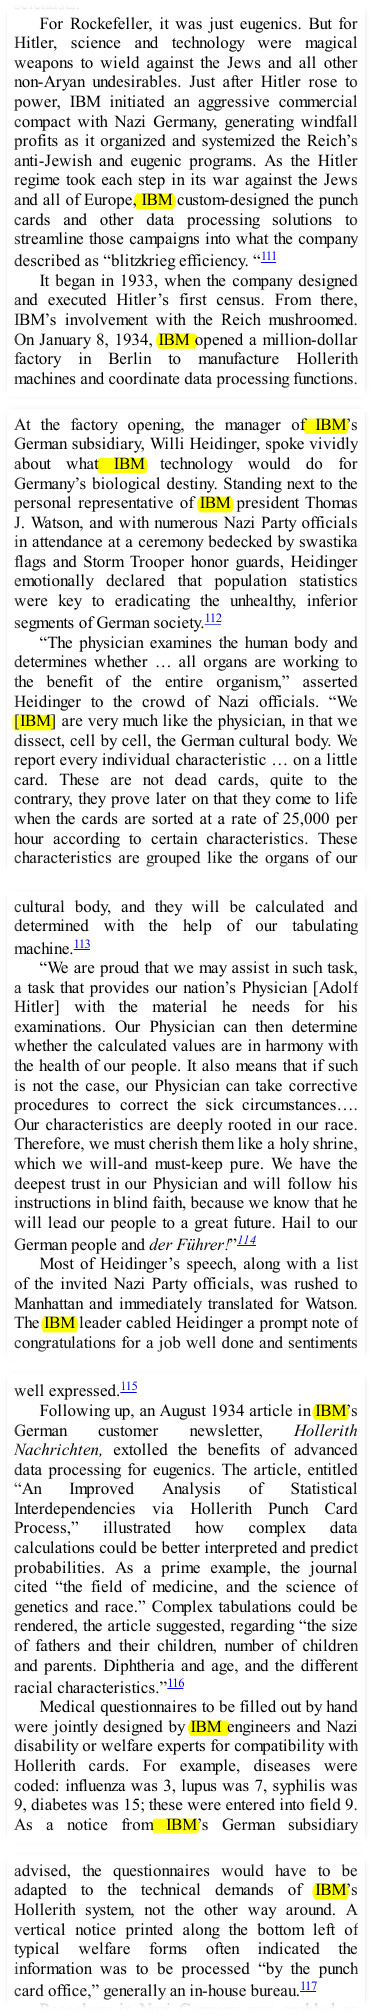 IBM eugenics p852-856